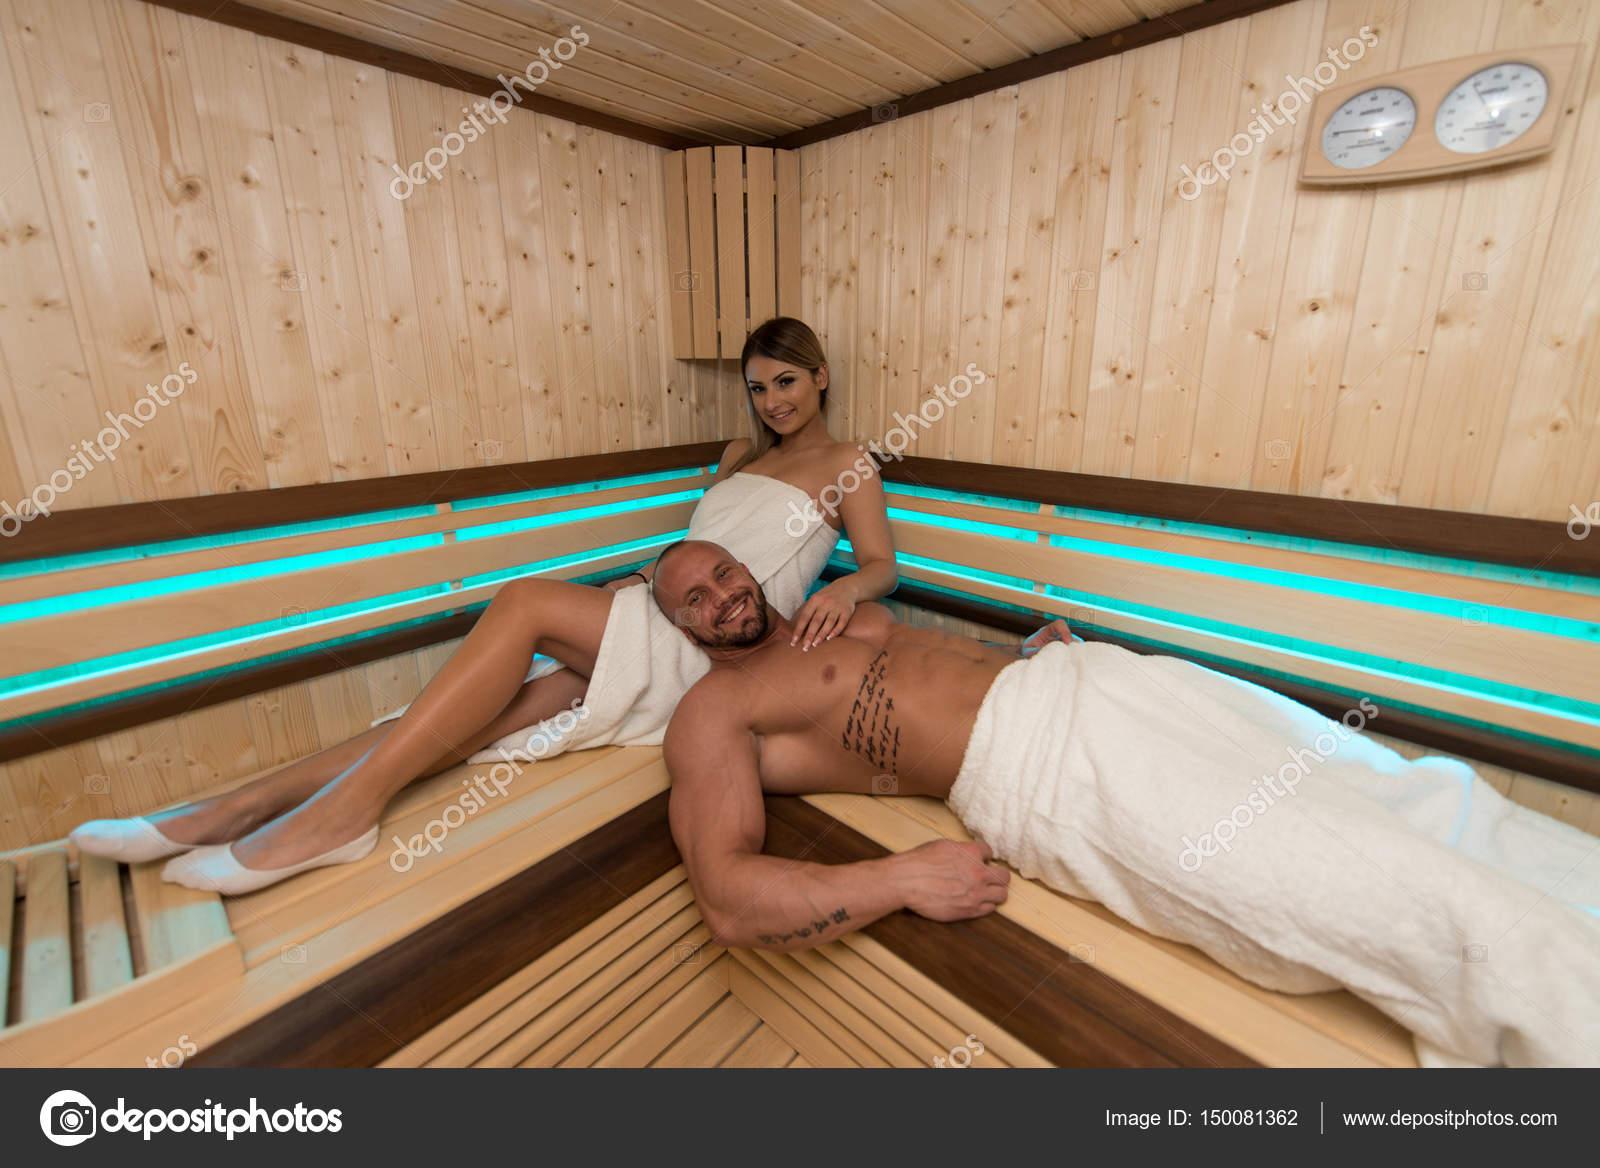 Футболисты в сауне, Жена Глушакова: Застала Дениса в бане с любовницей 25 фотография